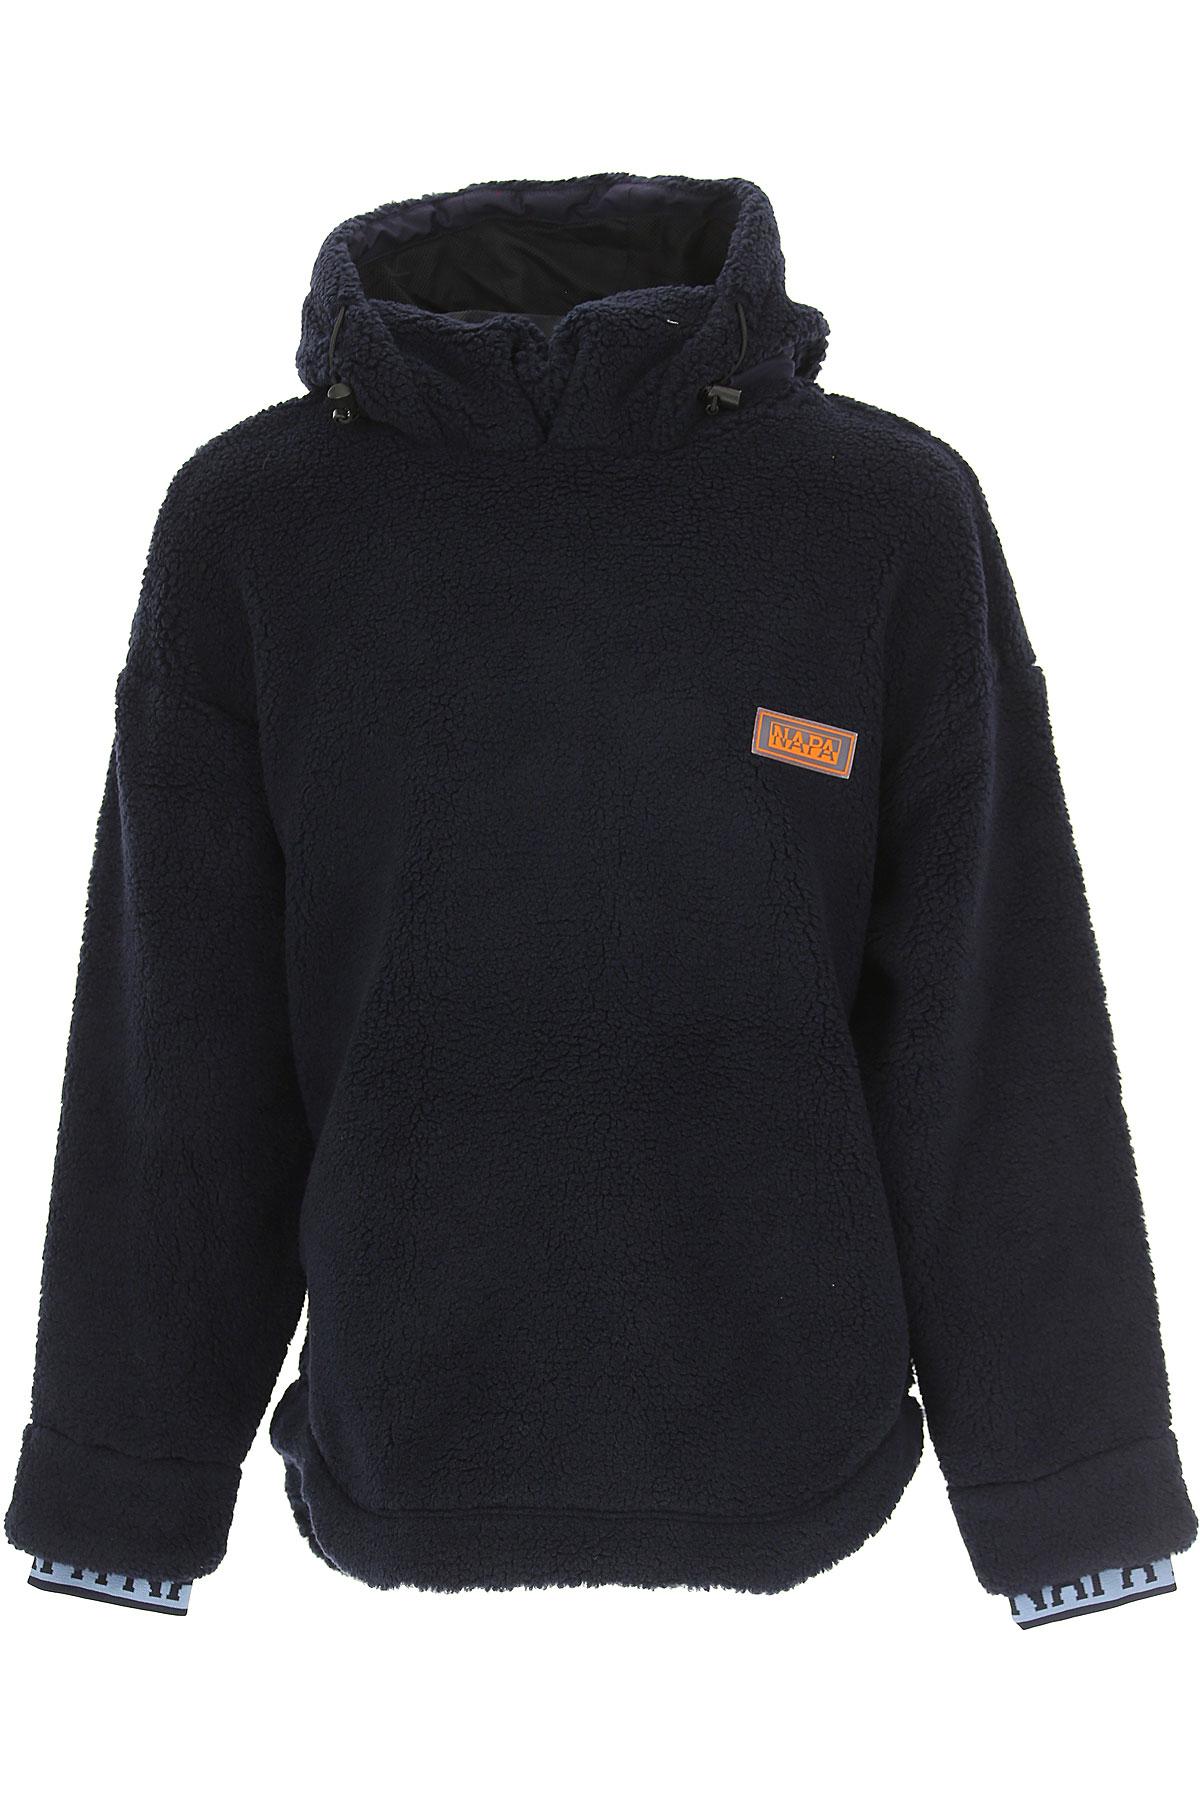 Image of Napapijri Sweater for Men Jumper, Dark Navy Blue, polyester, 2017, L M S XL